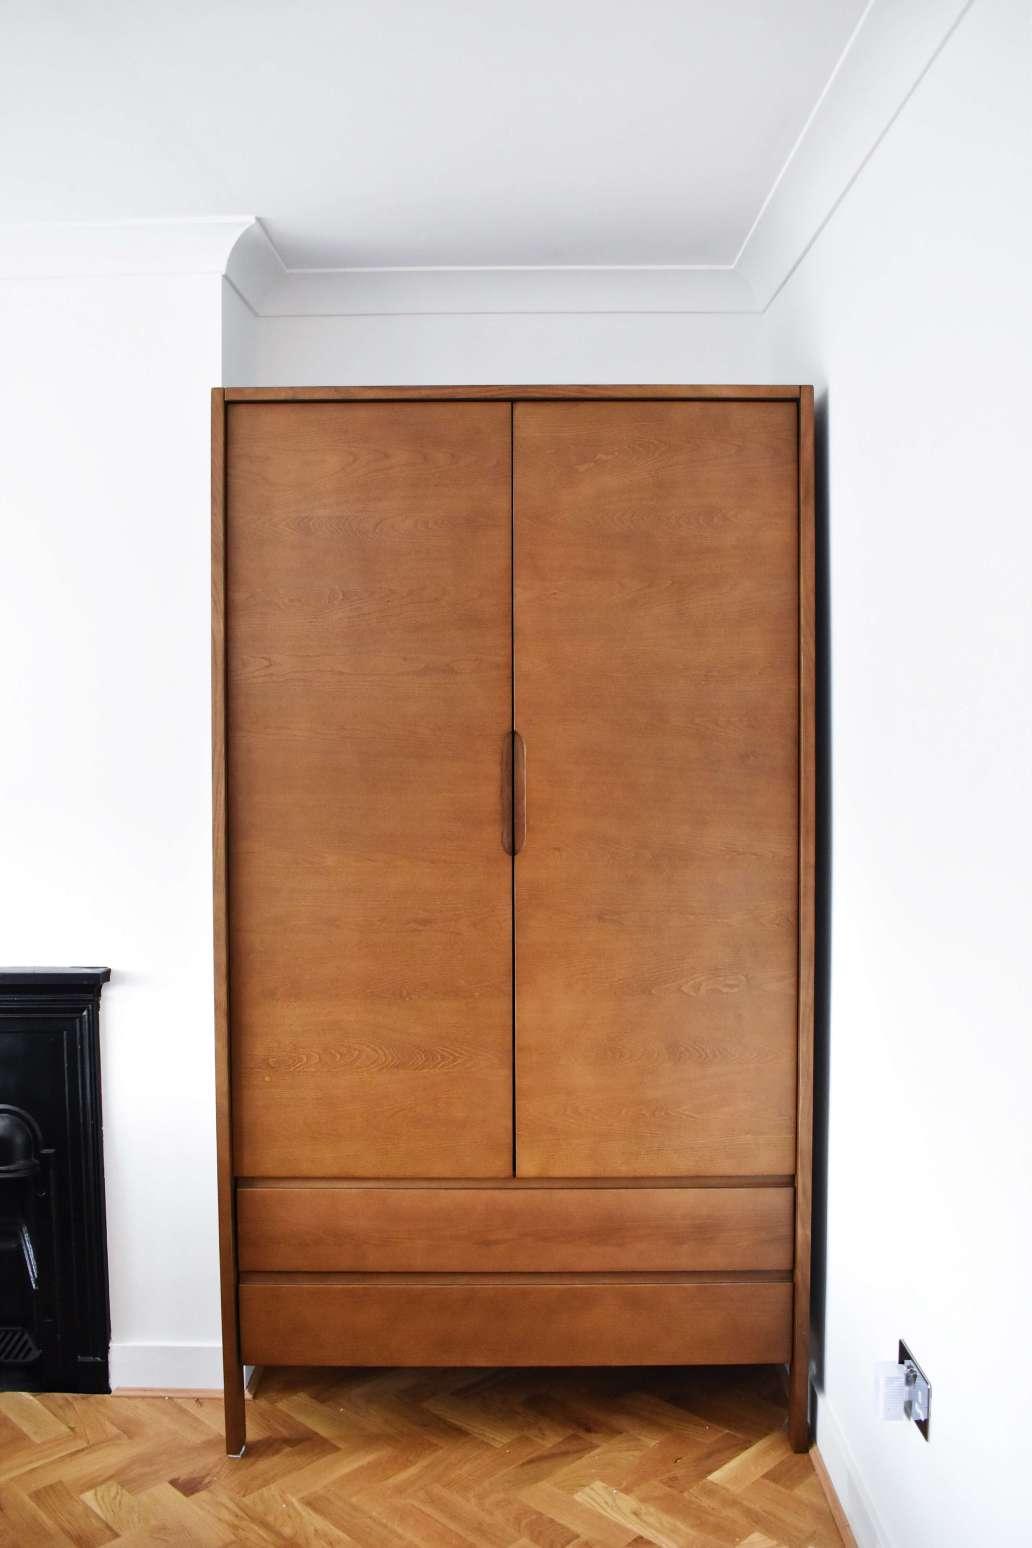 rumman amin 3fFBoEHee28 unsplash 2 1365x2048 - Comment meubler vos chambres d'hôtes ?